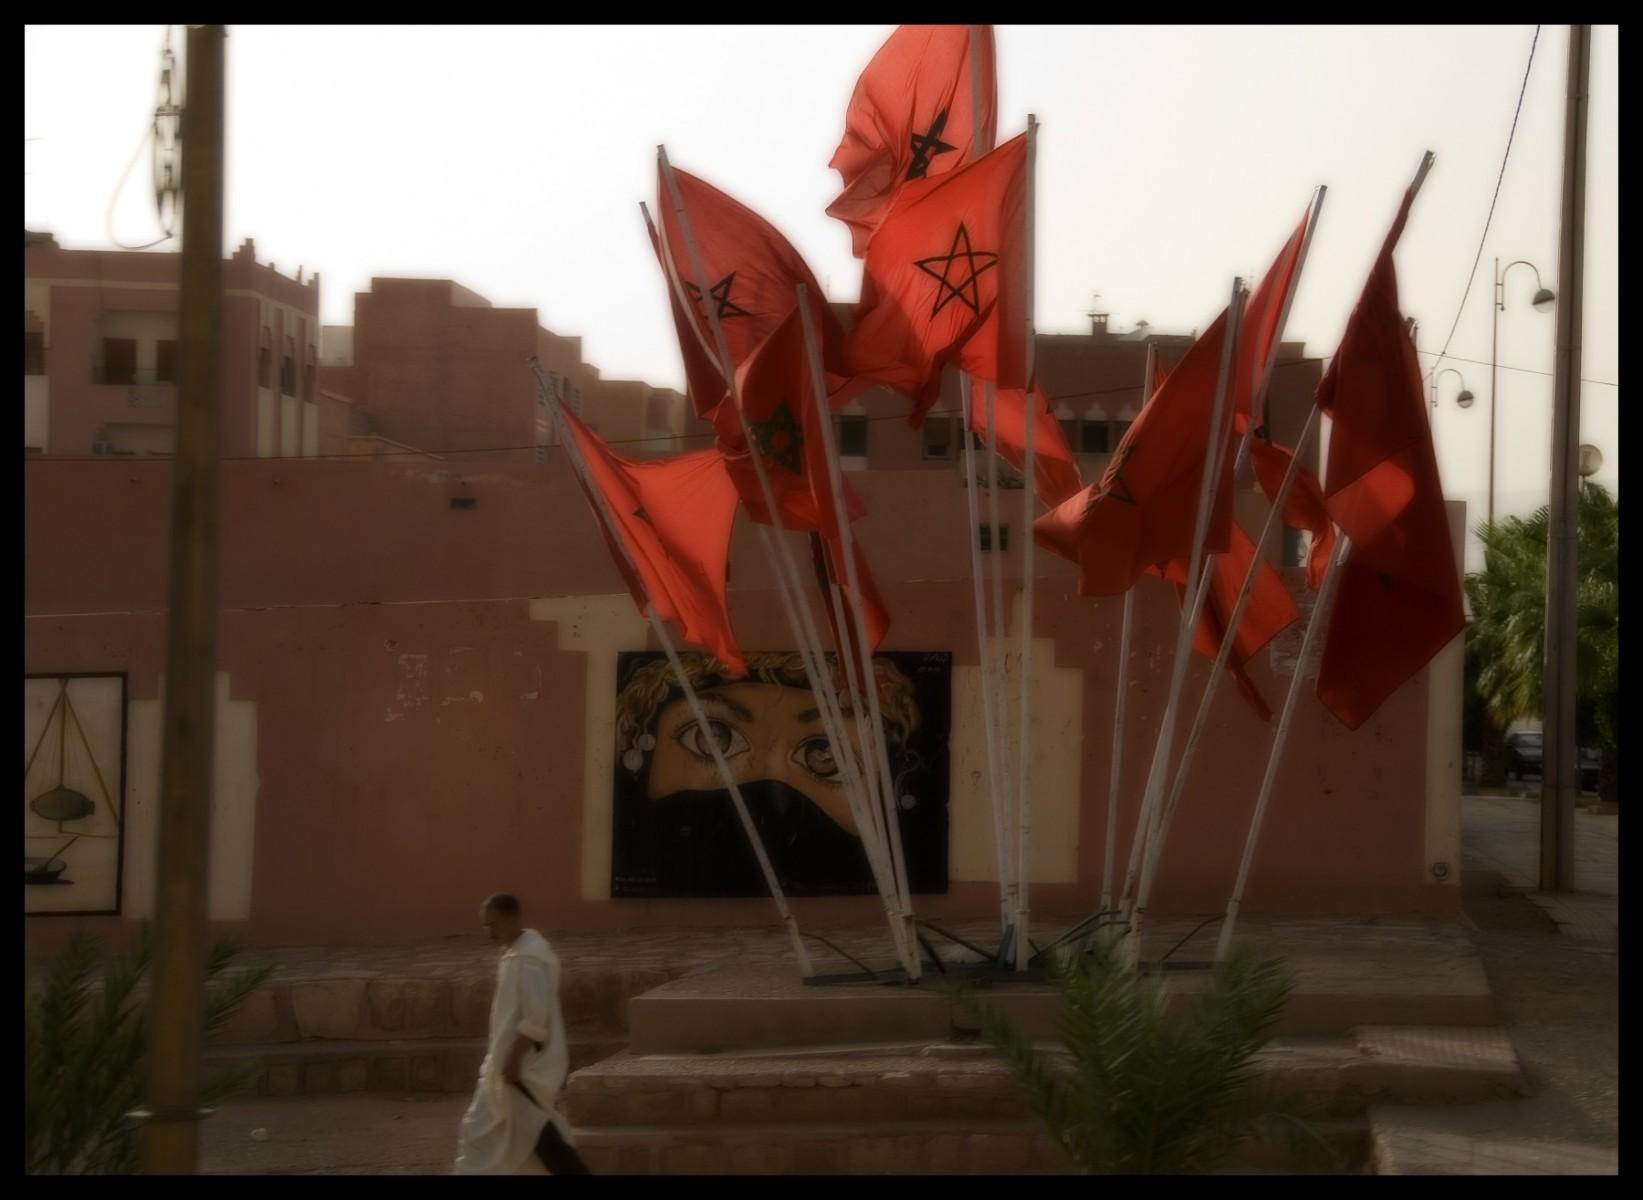 98617_DSC0073-red-morocco Storie di Luce